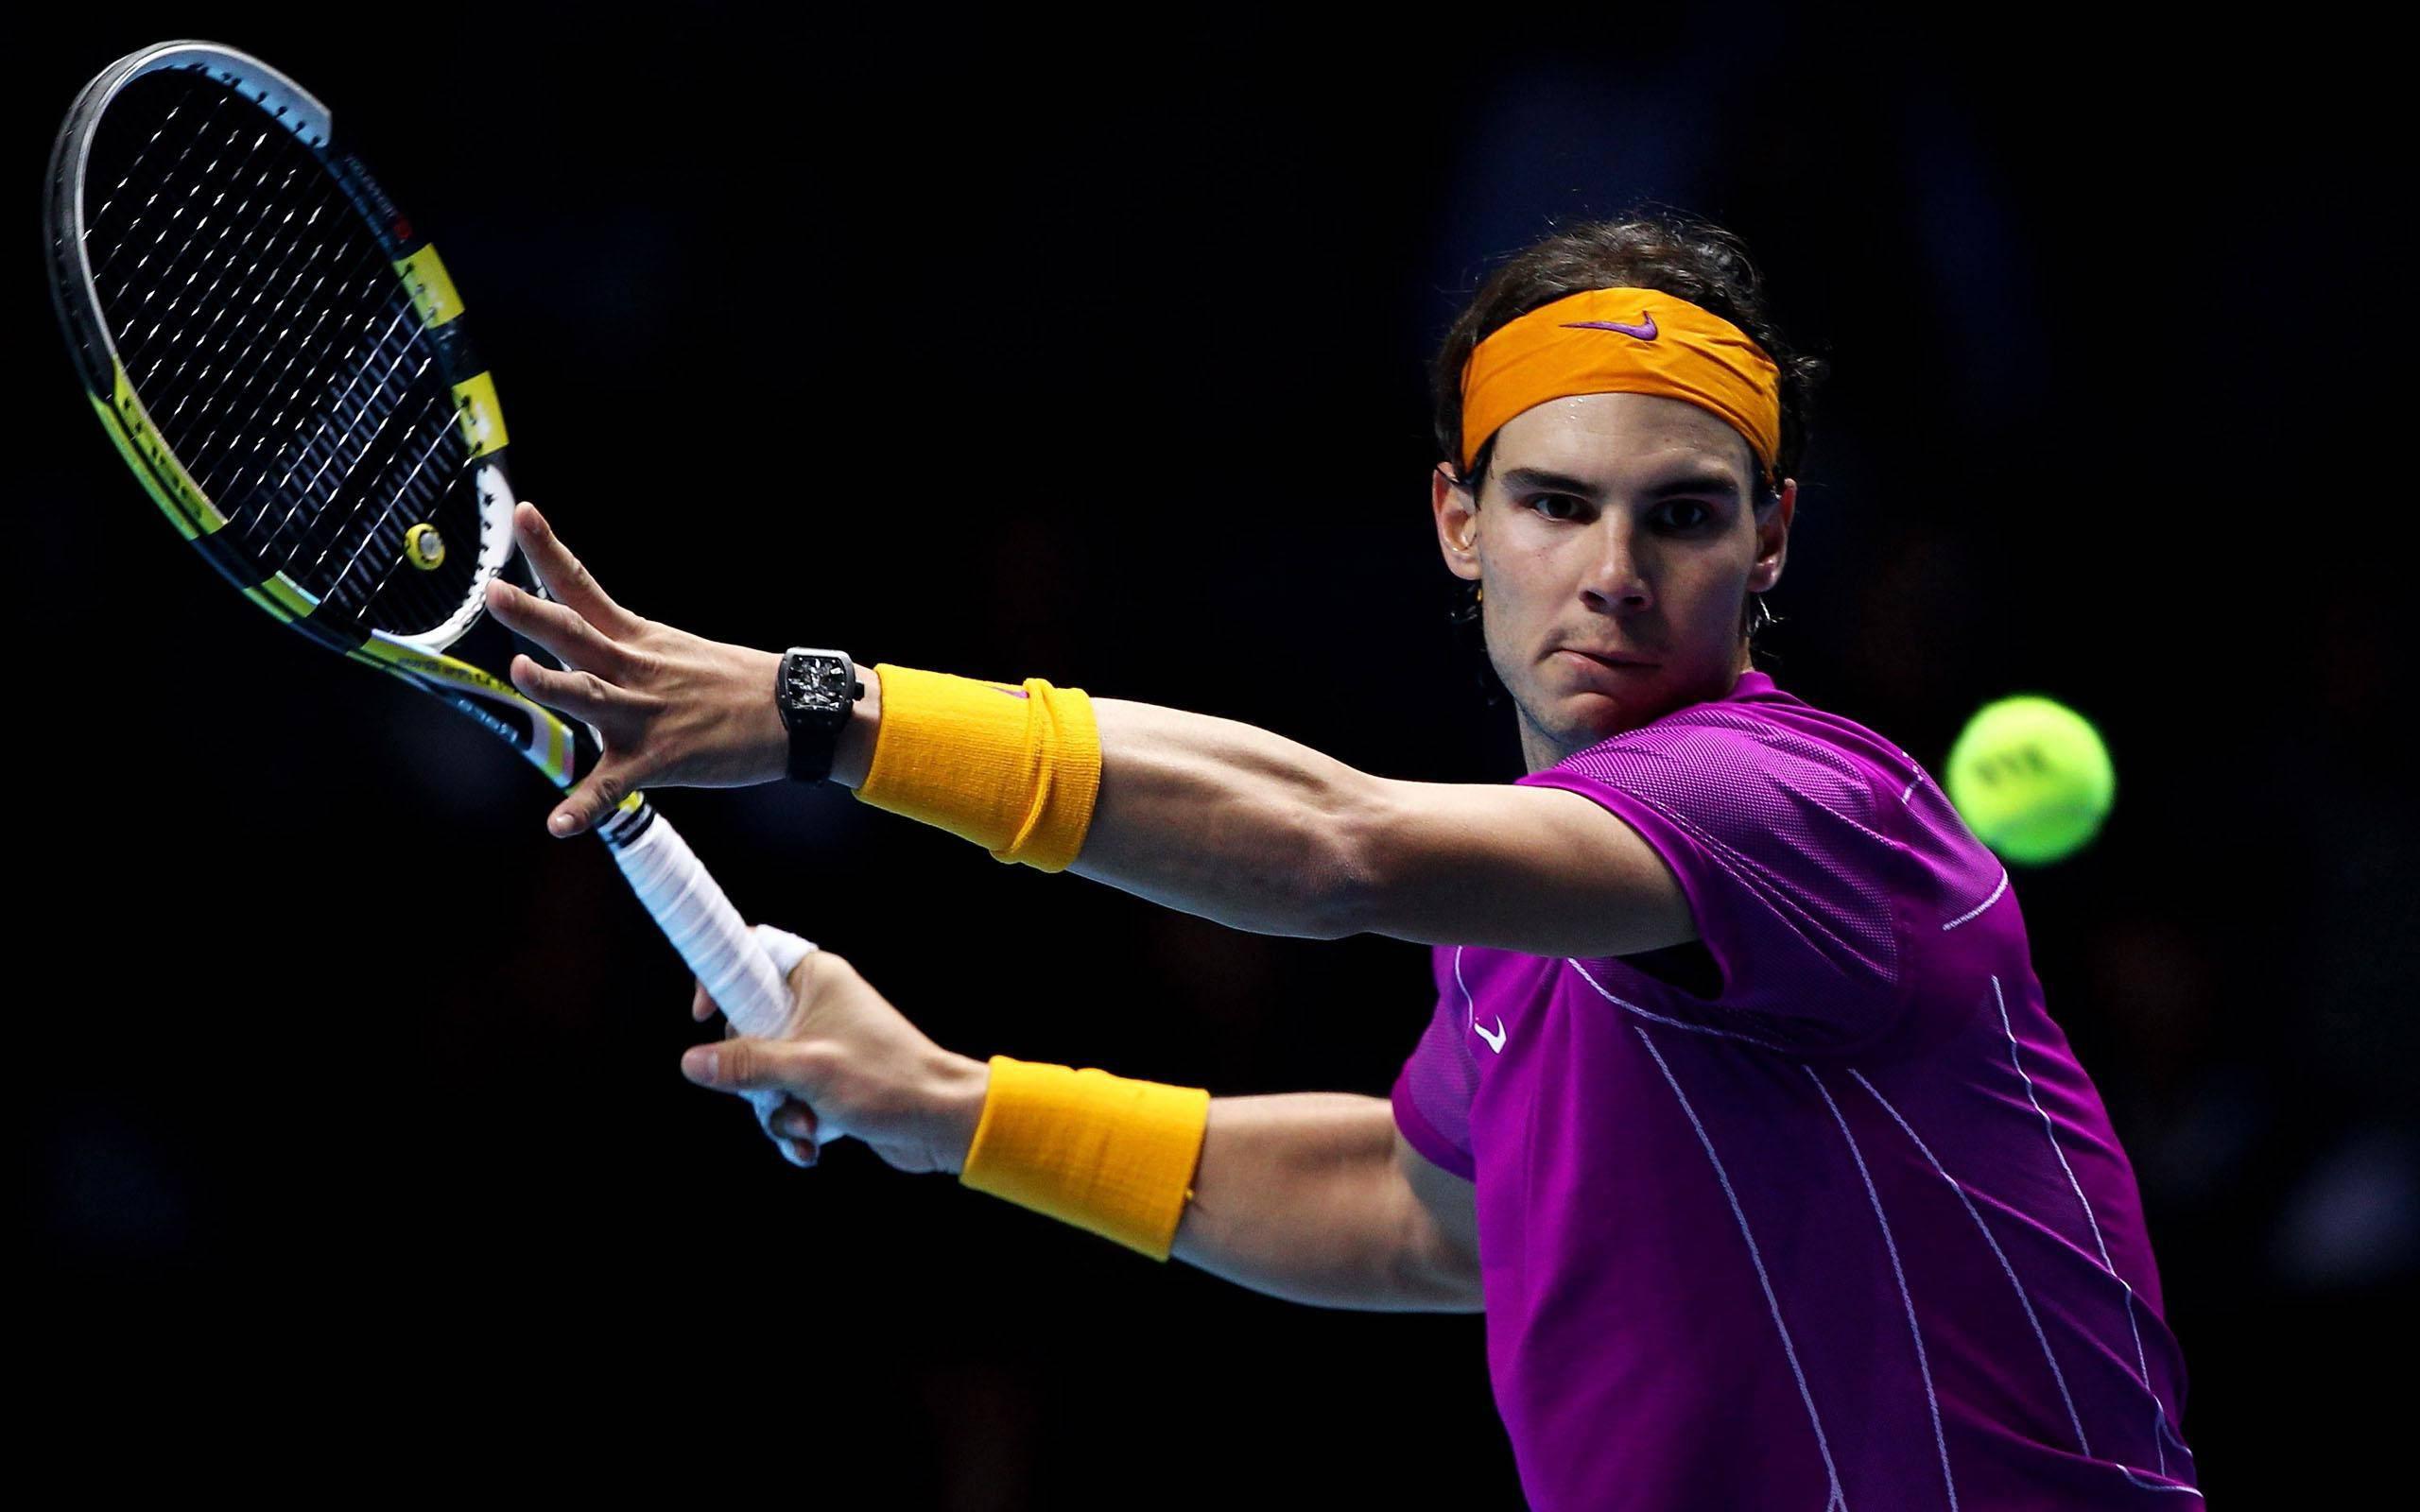 Rafael Nadal Wallpaper 23   2560 X 1600 stmednet 2560x1600